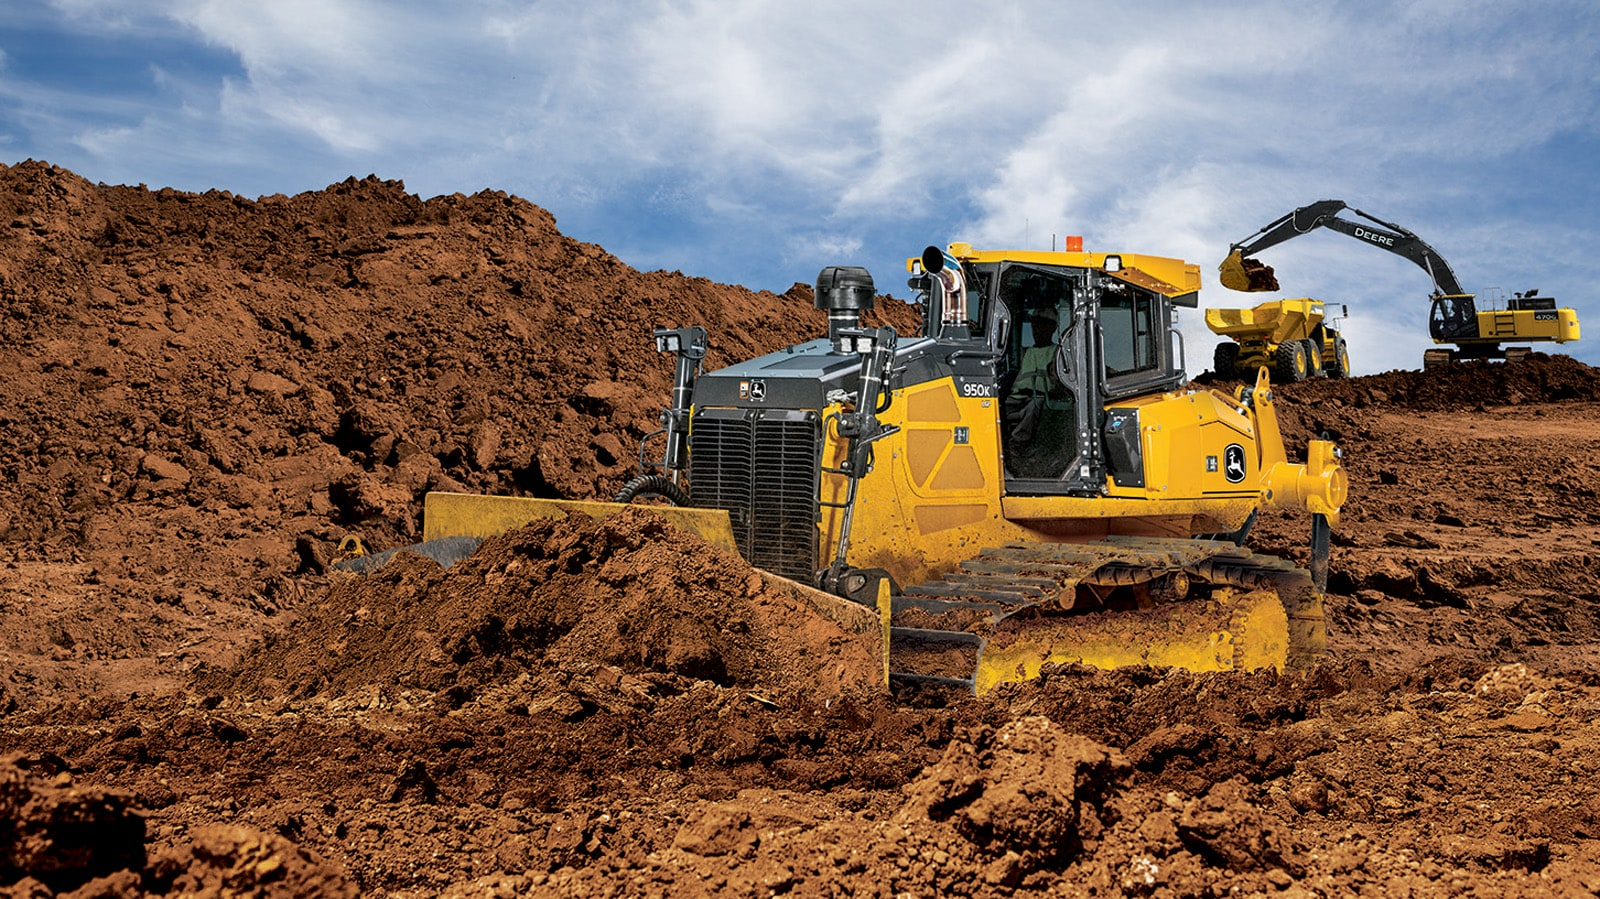 950k crawler dozer largest pat machine in north america